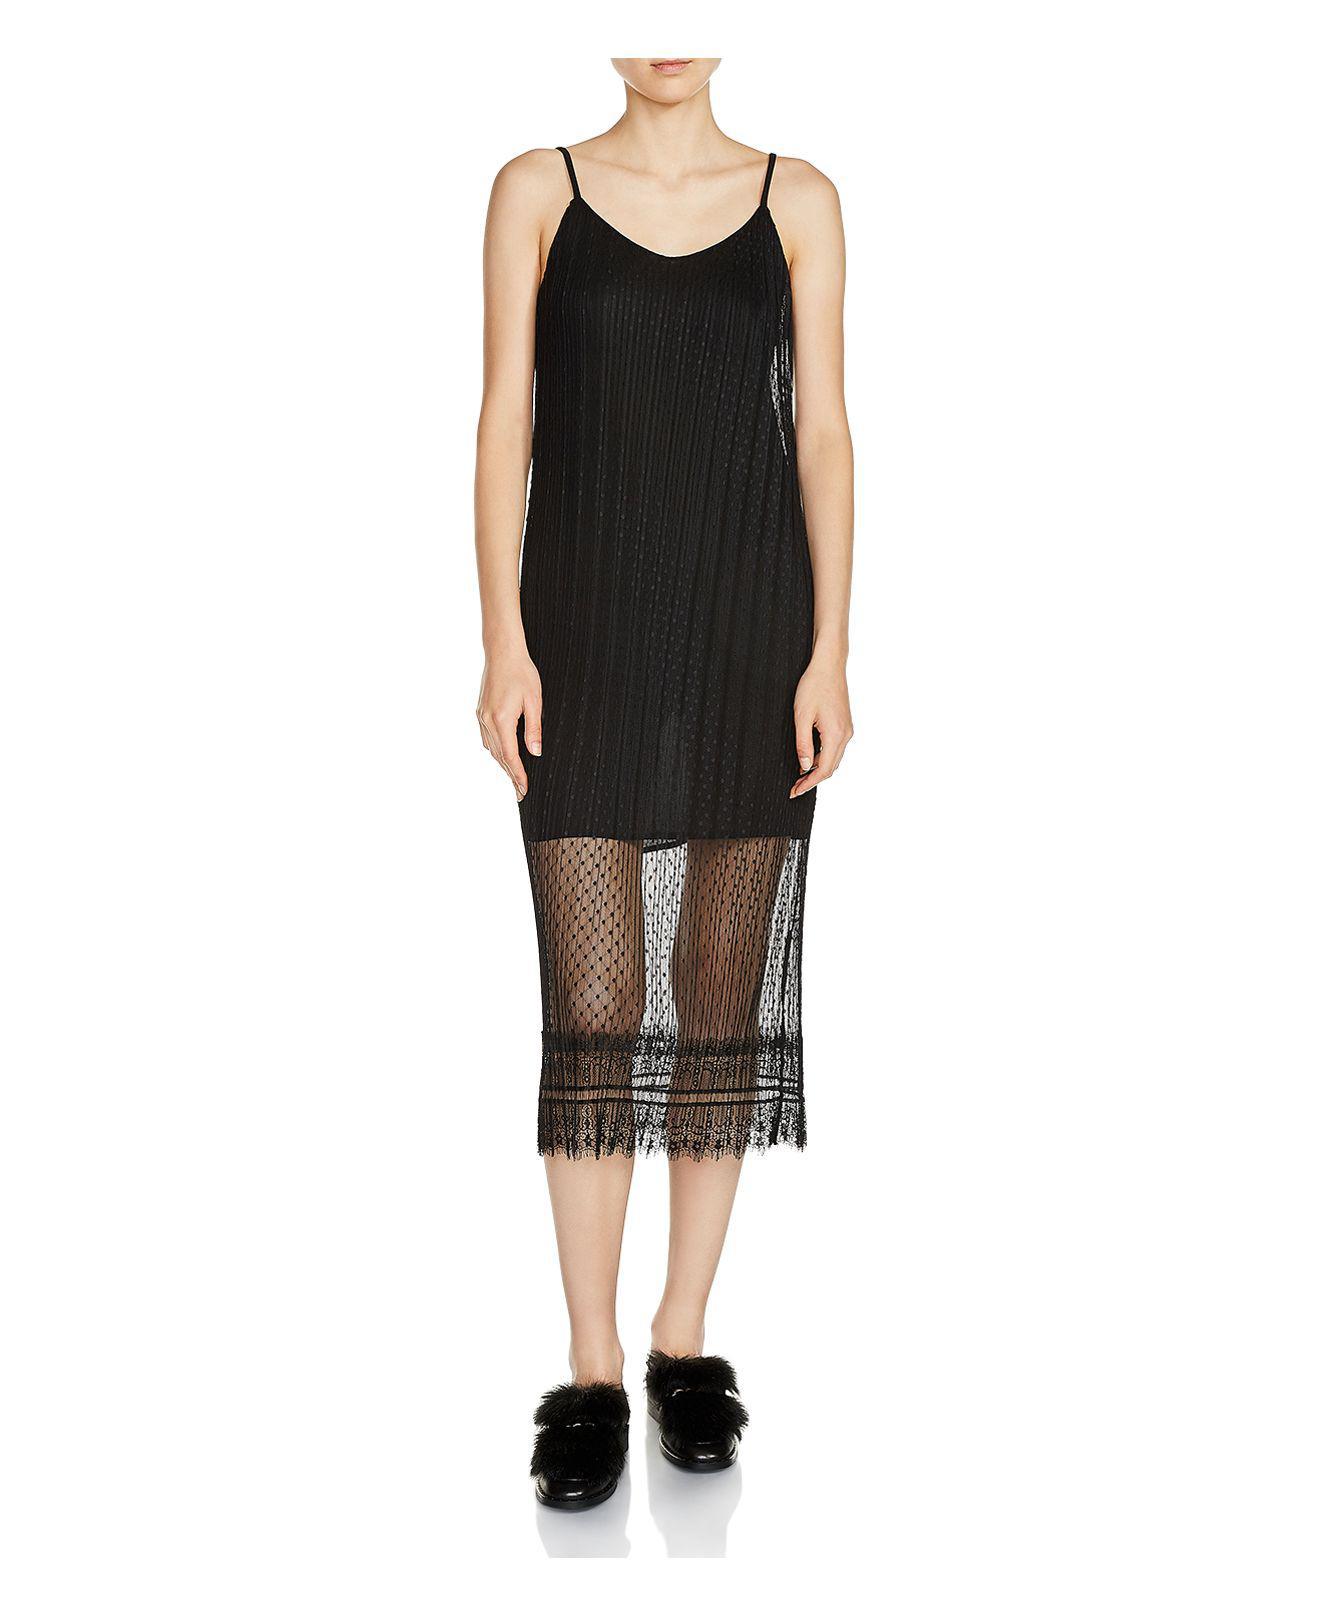 Lyst Maje Raelys Lace Midi Dress In Black